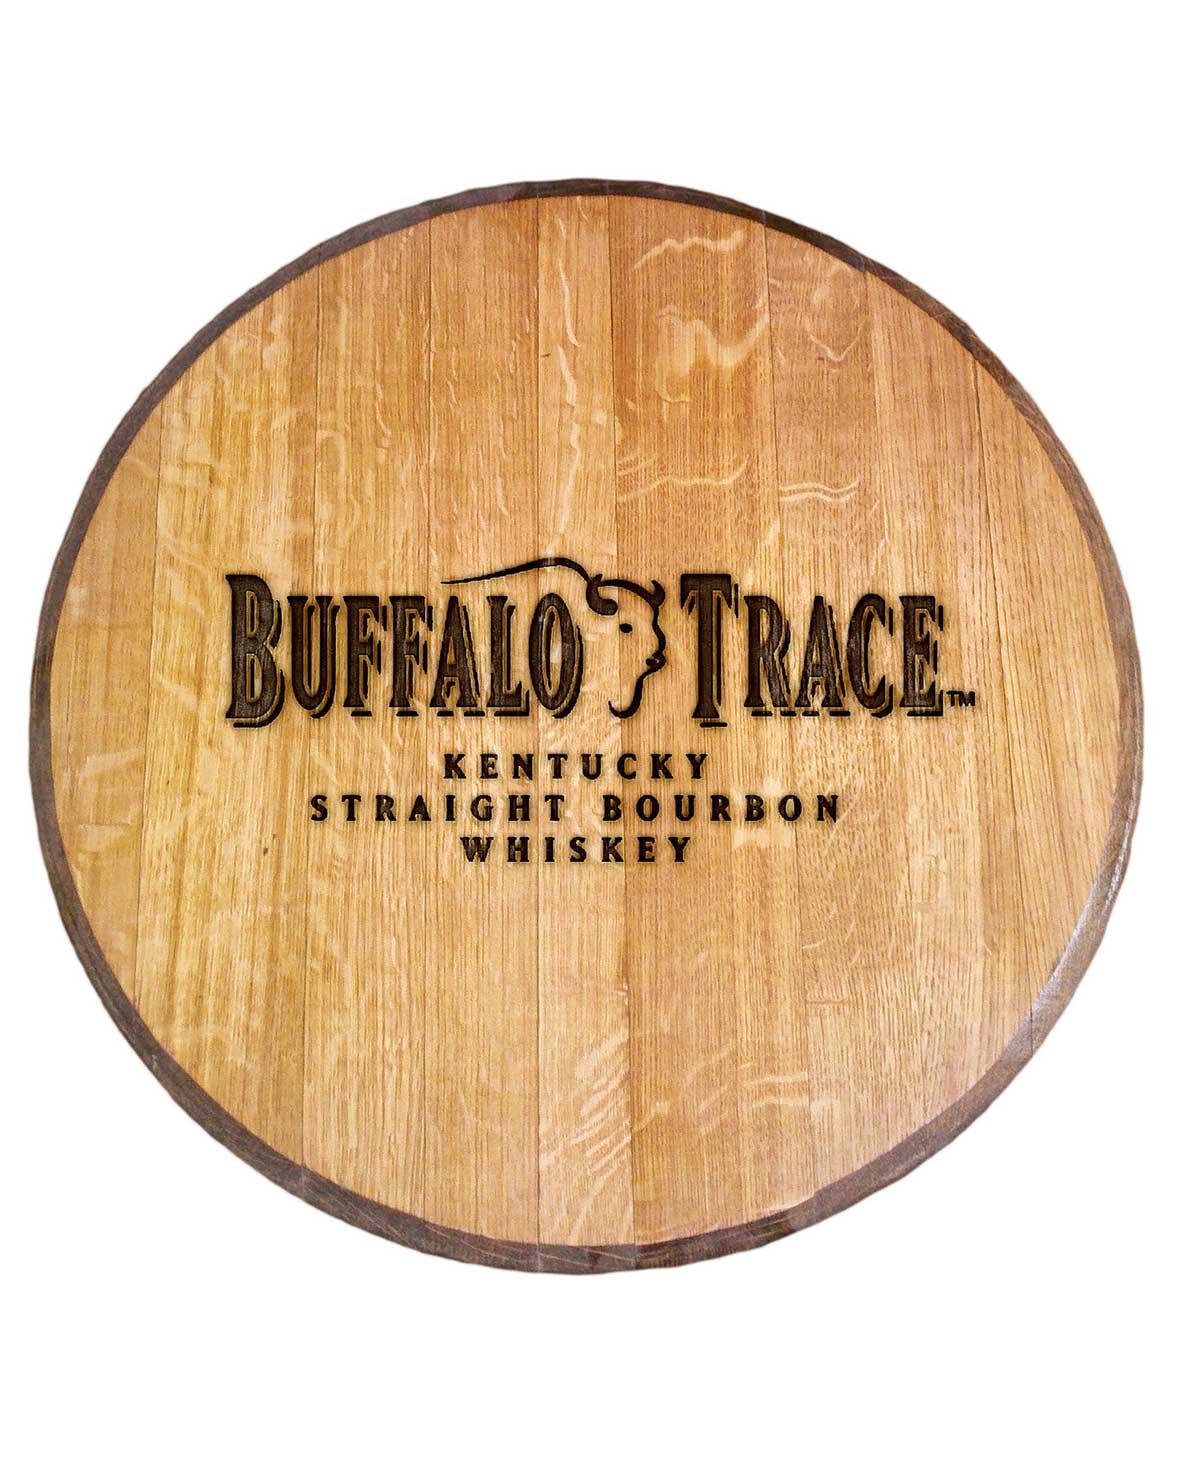 Buffalo Trace Bourbon Barrel Head